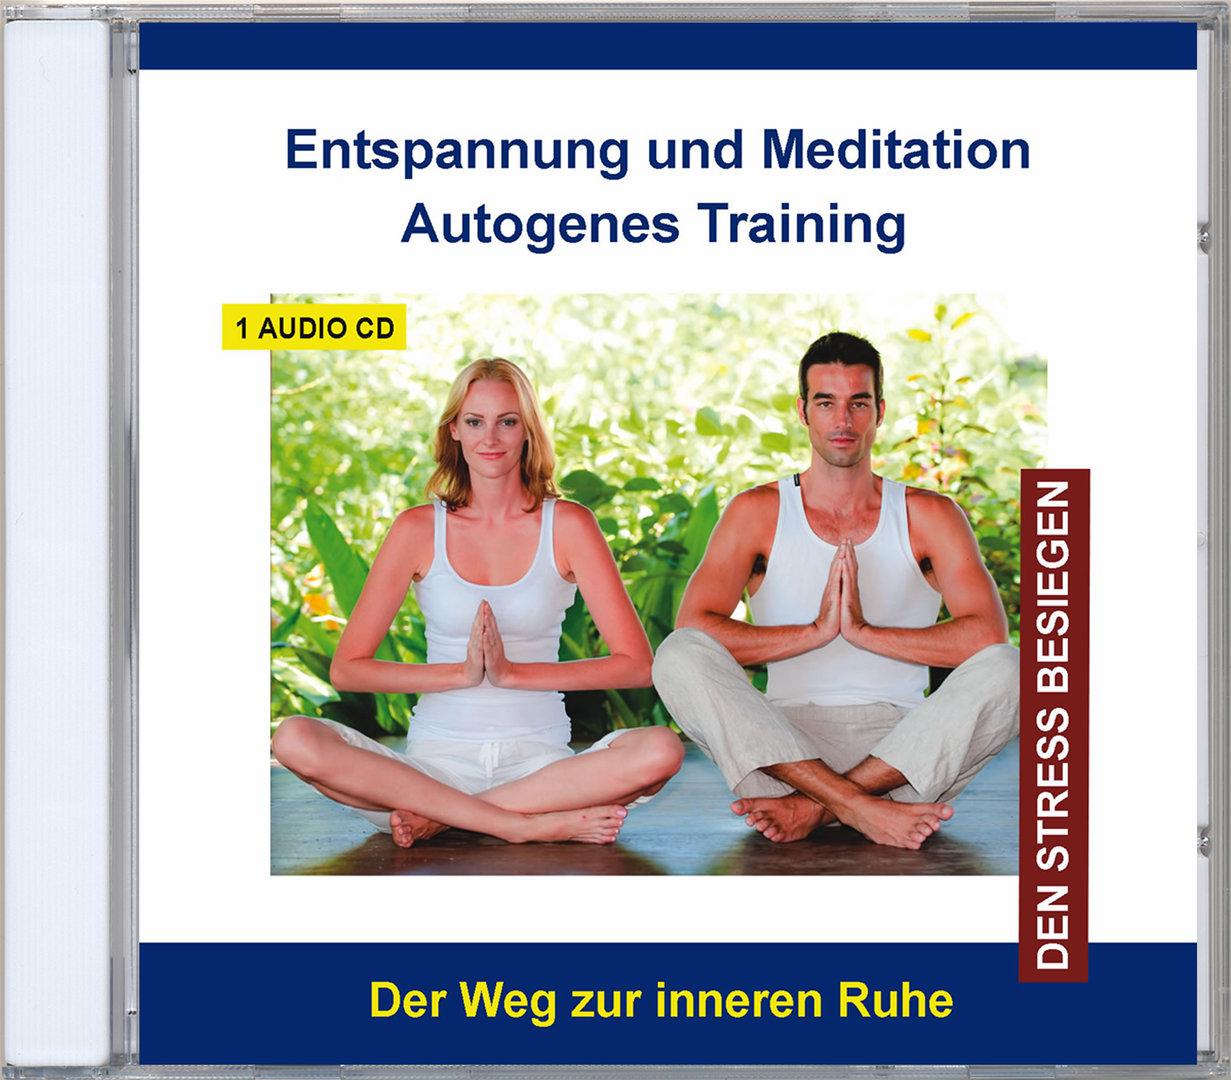 entspannung und meditation autogenes training audio cd. Black Bedroom Furniture Sets. Home Design Ideas